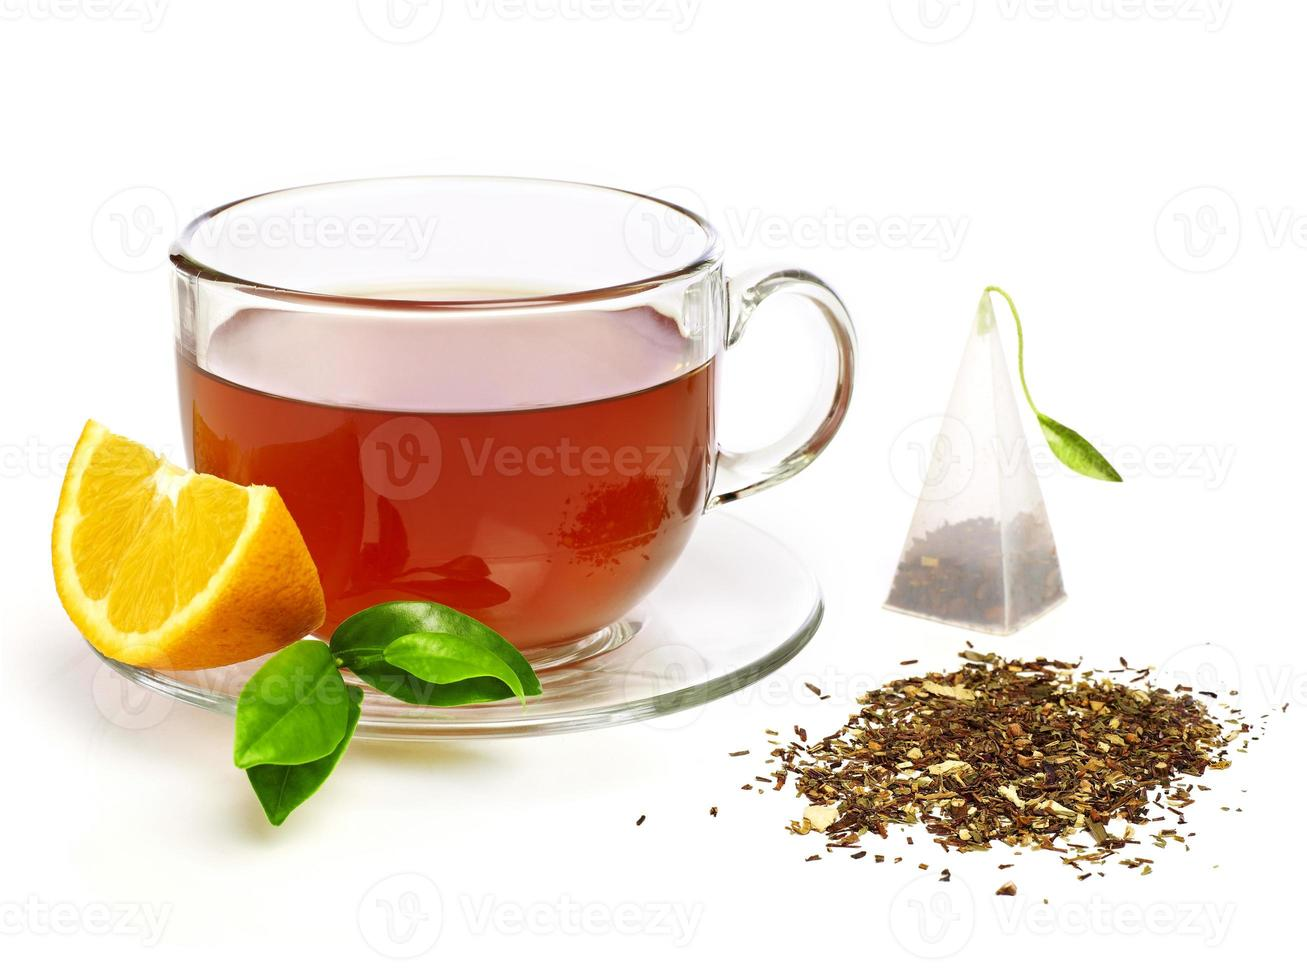 kopje thee met citroen foto